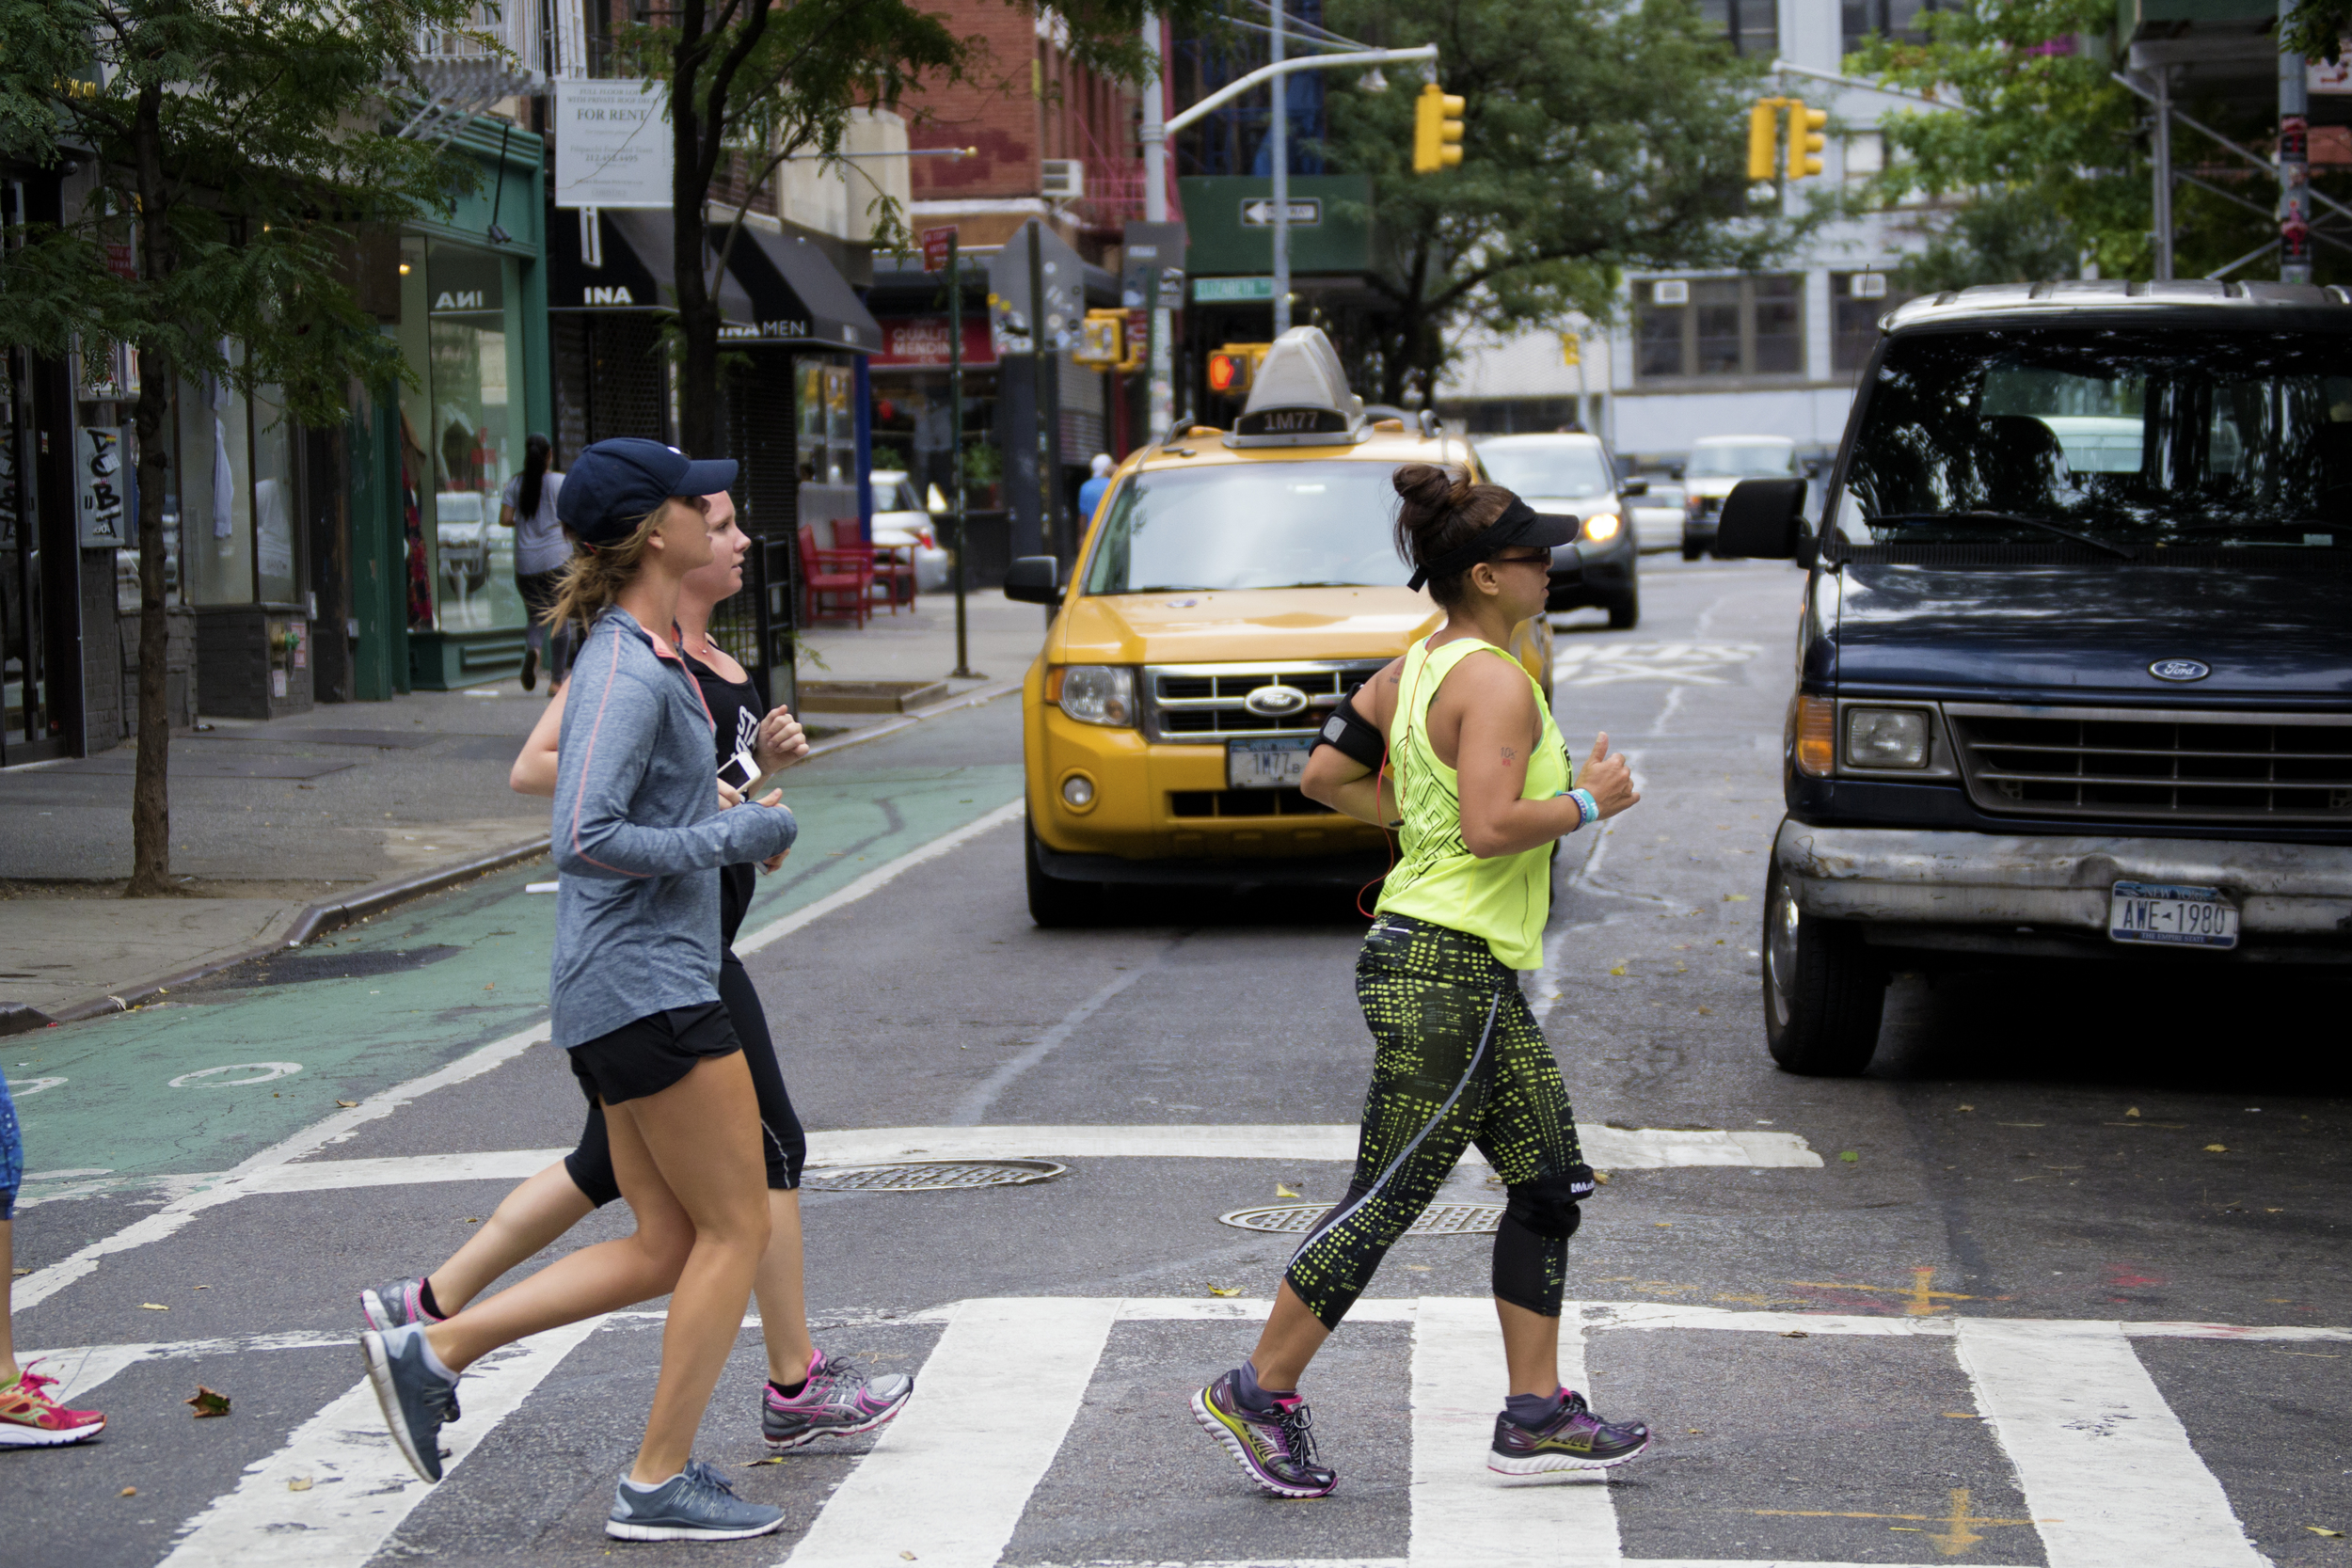 runners-nye-streets-cab-Runstreet